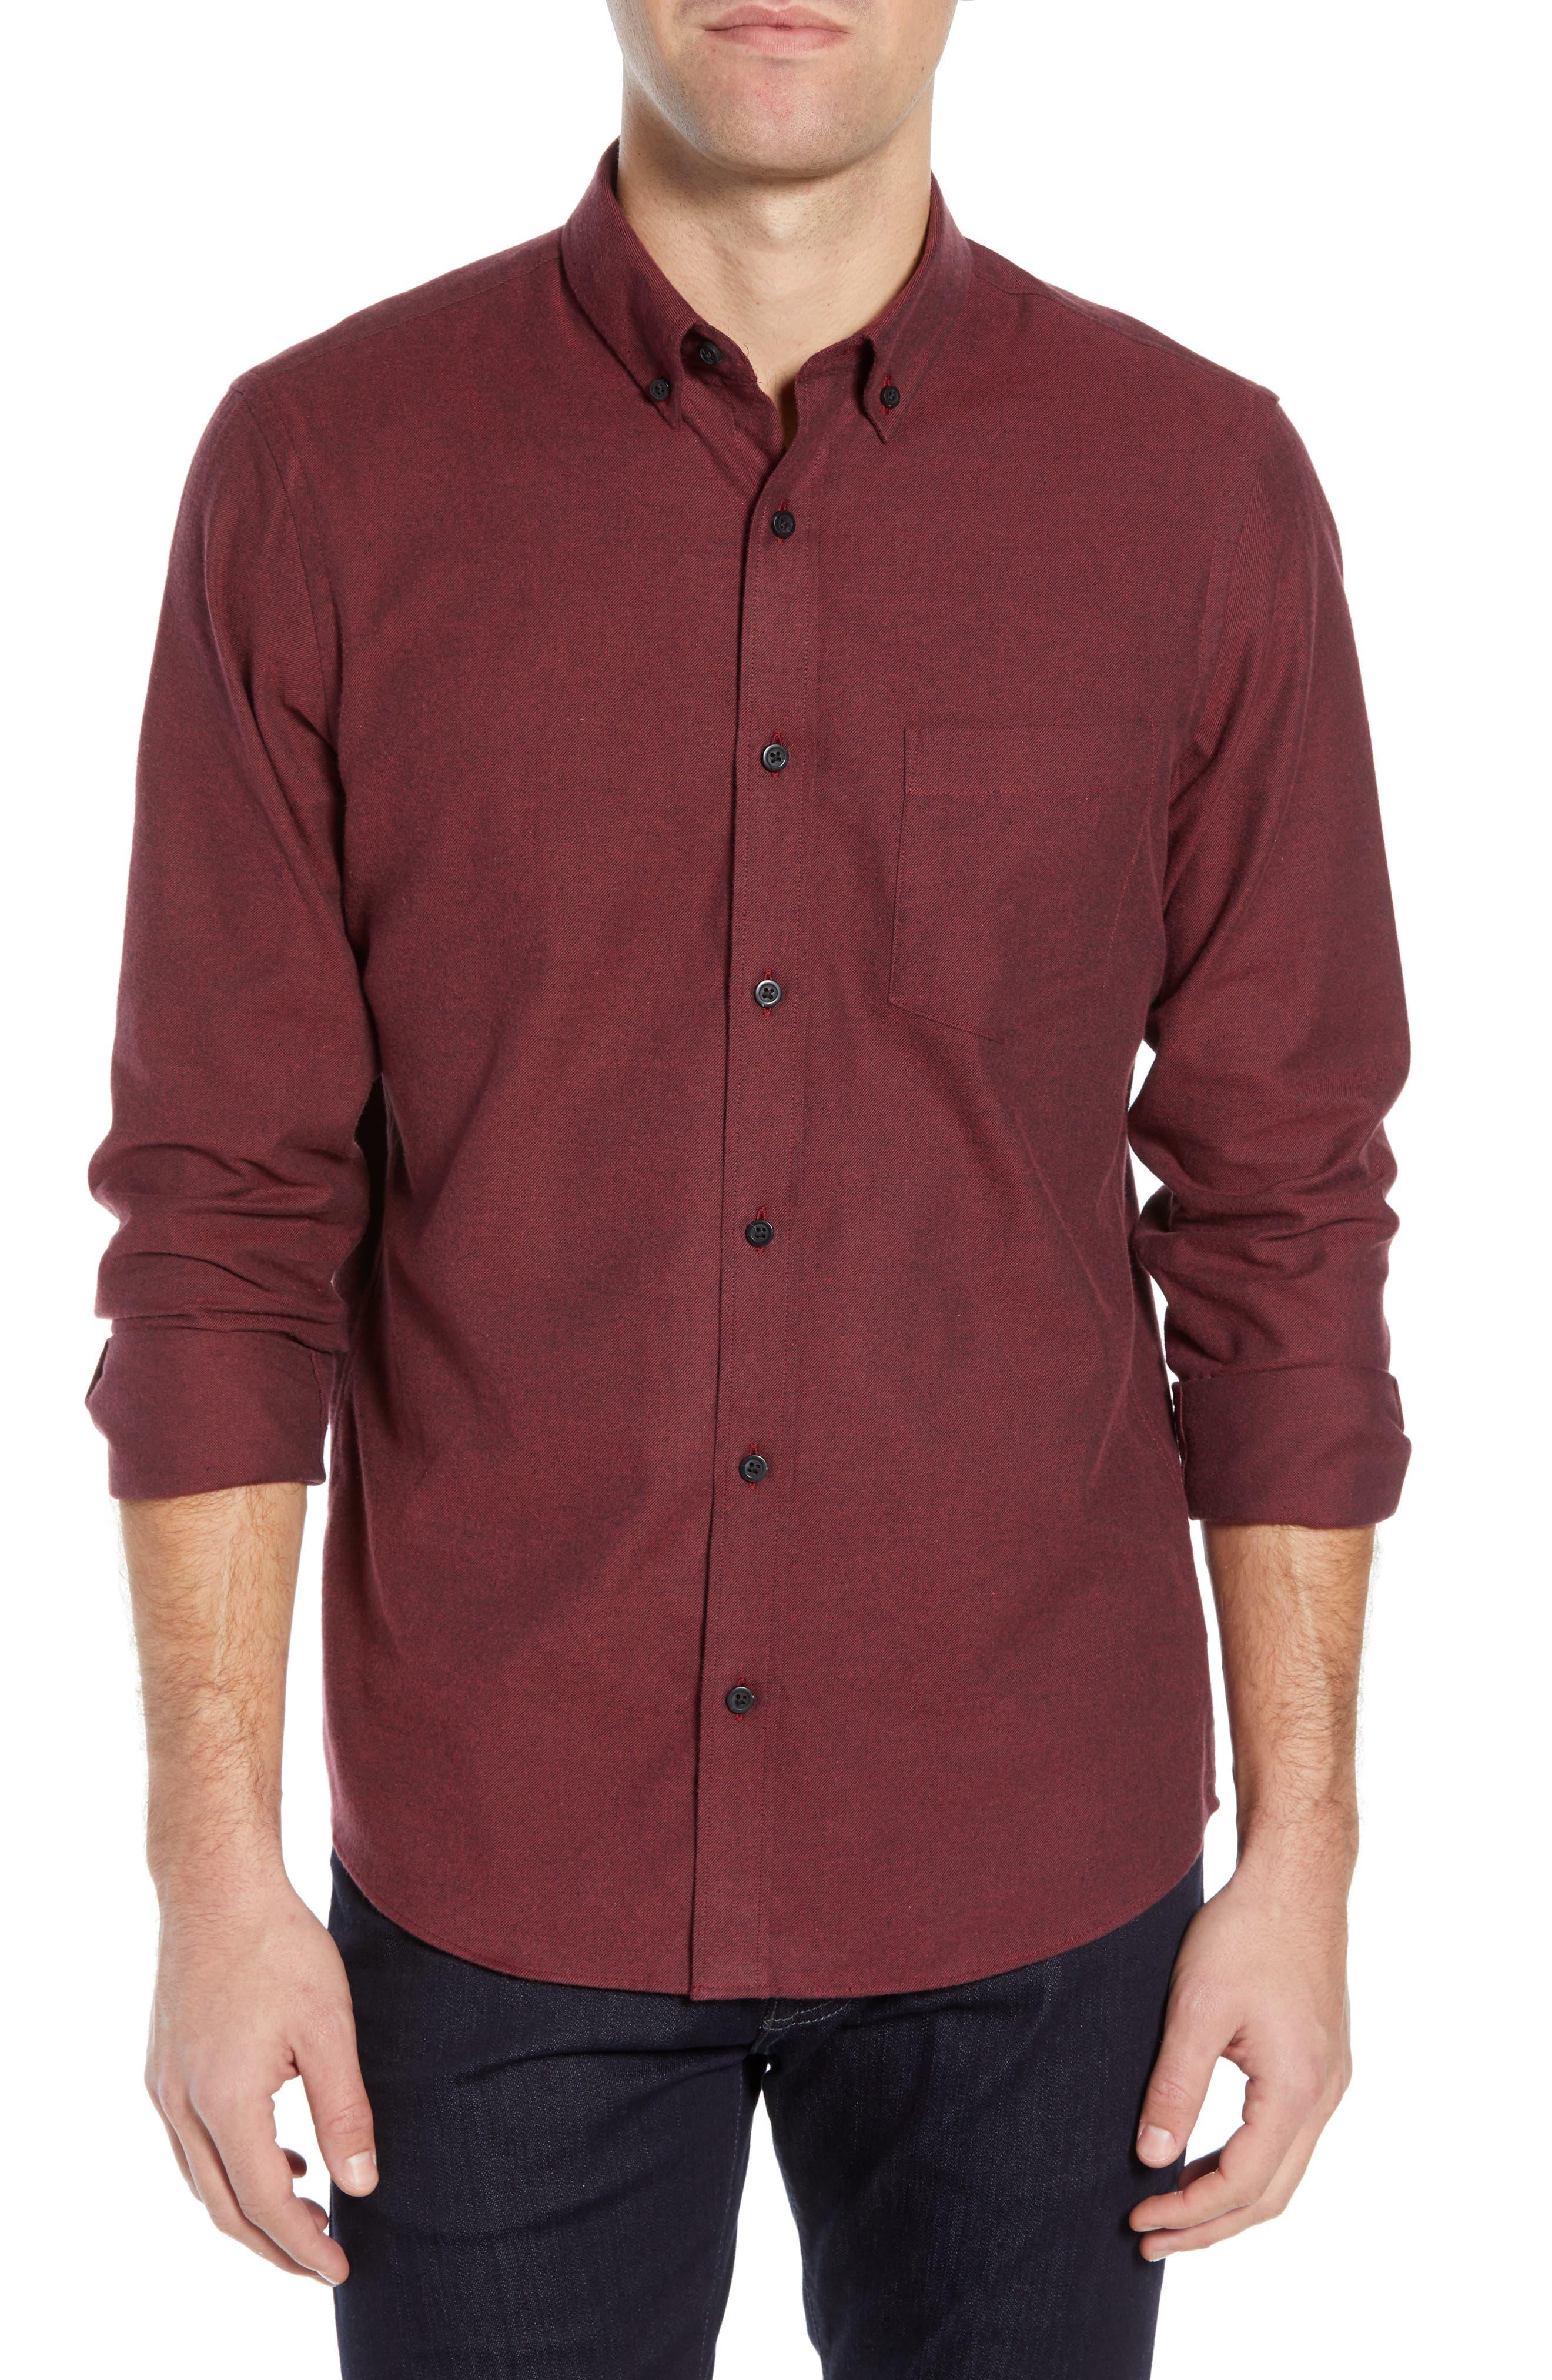 NORDSTROM MEN'S SHOP Slim Fit Brushed Twill Sport Shirt, Main, color, RED JESTER BRUSHED TWILL